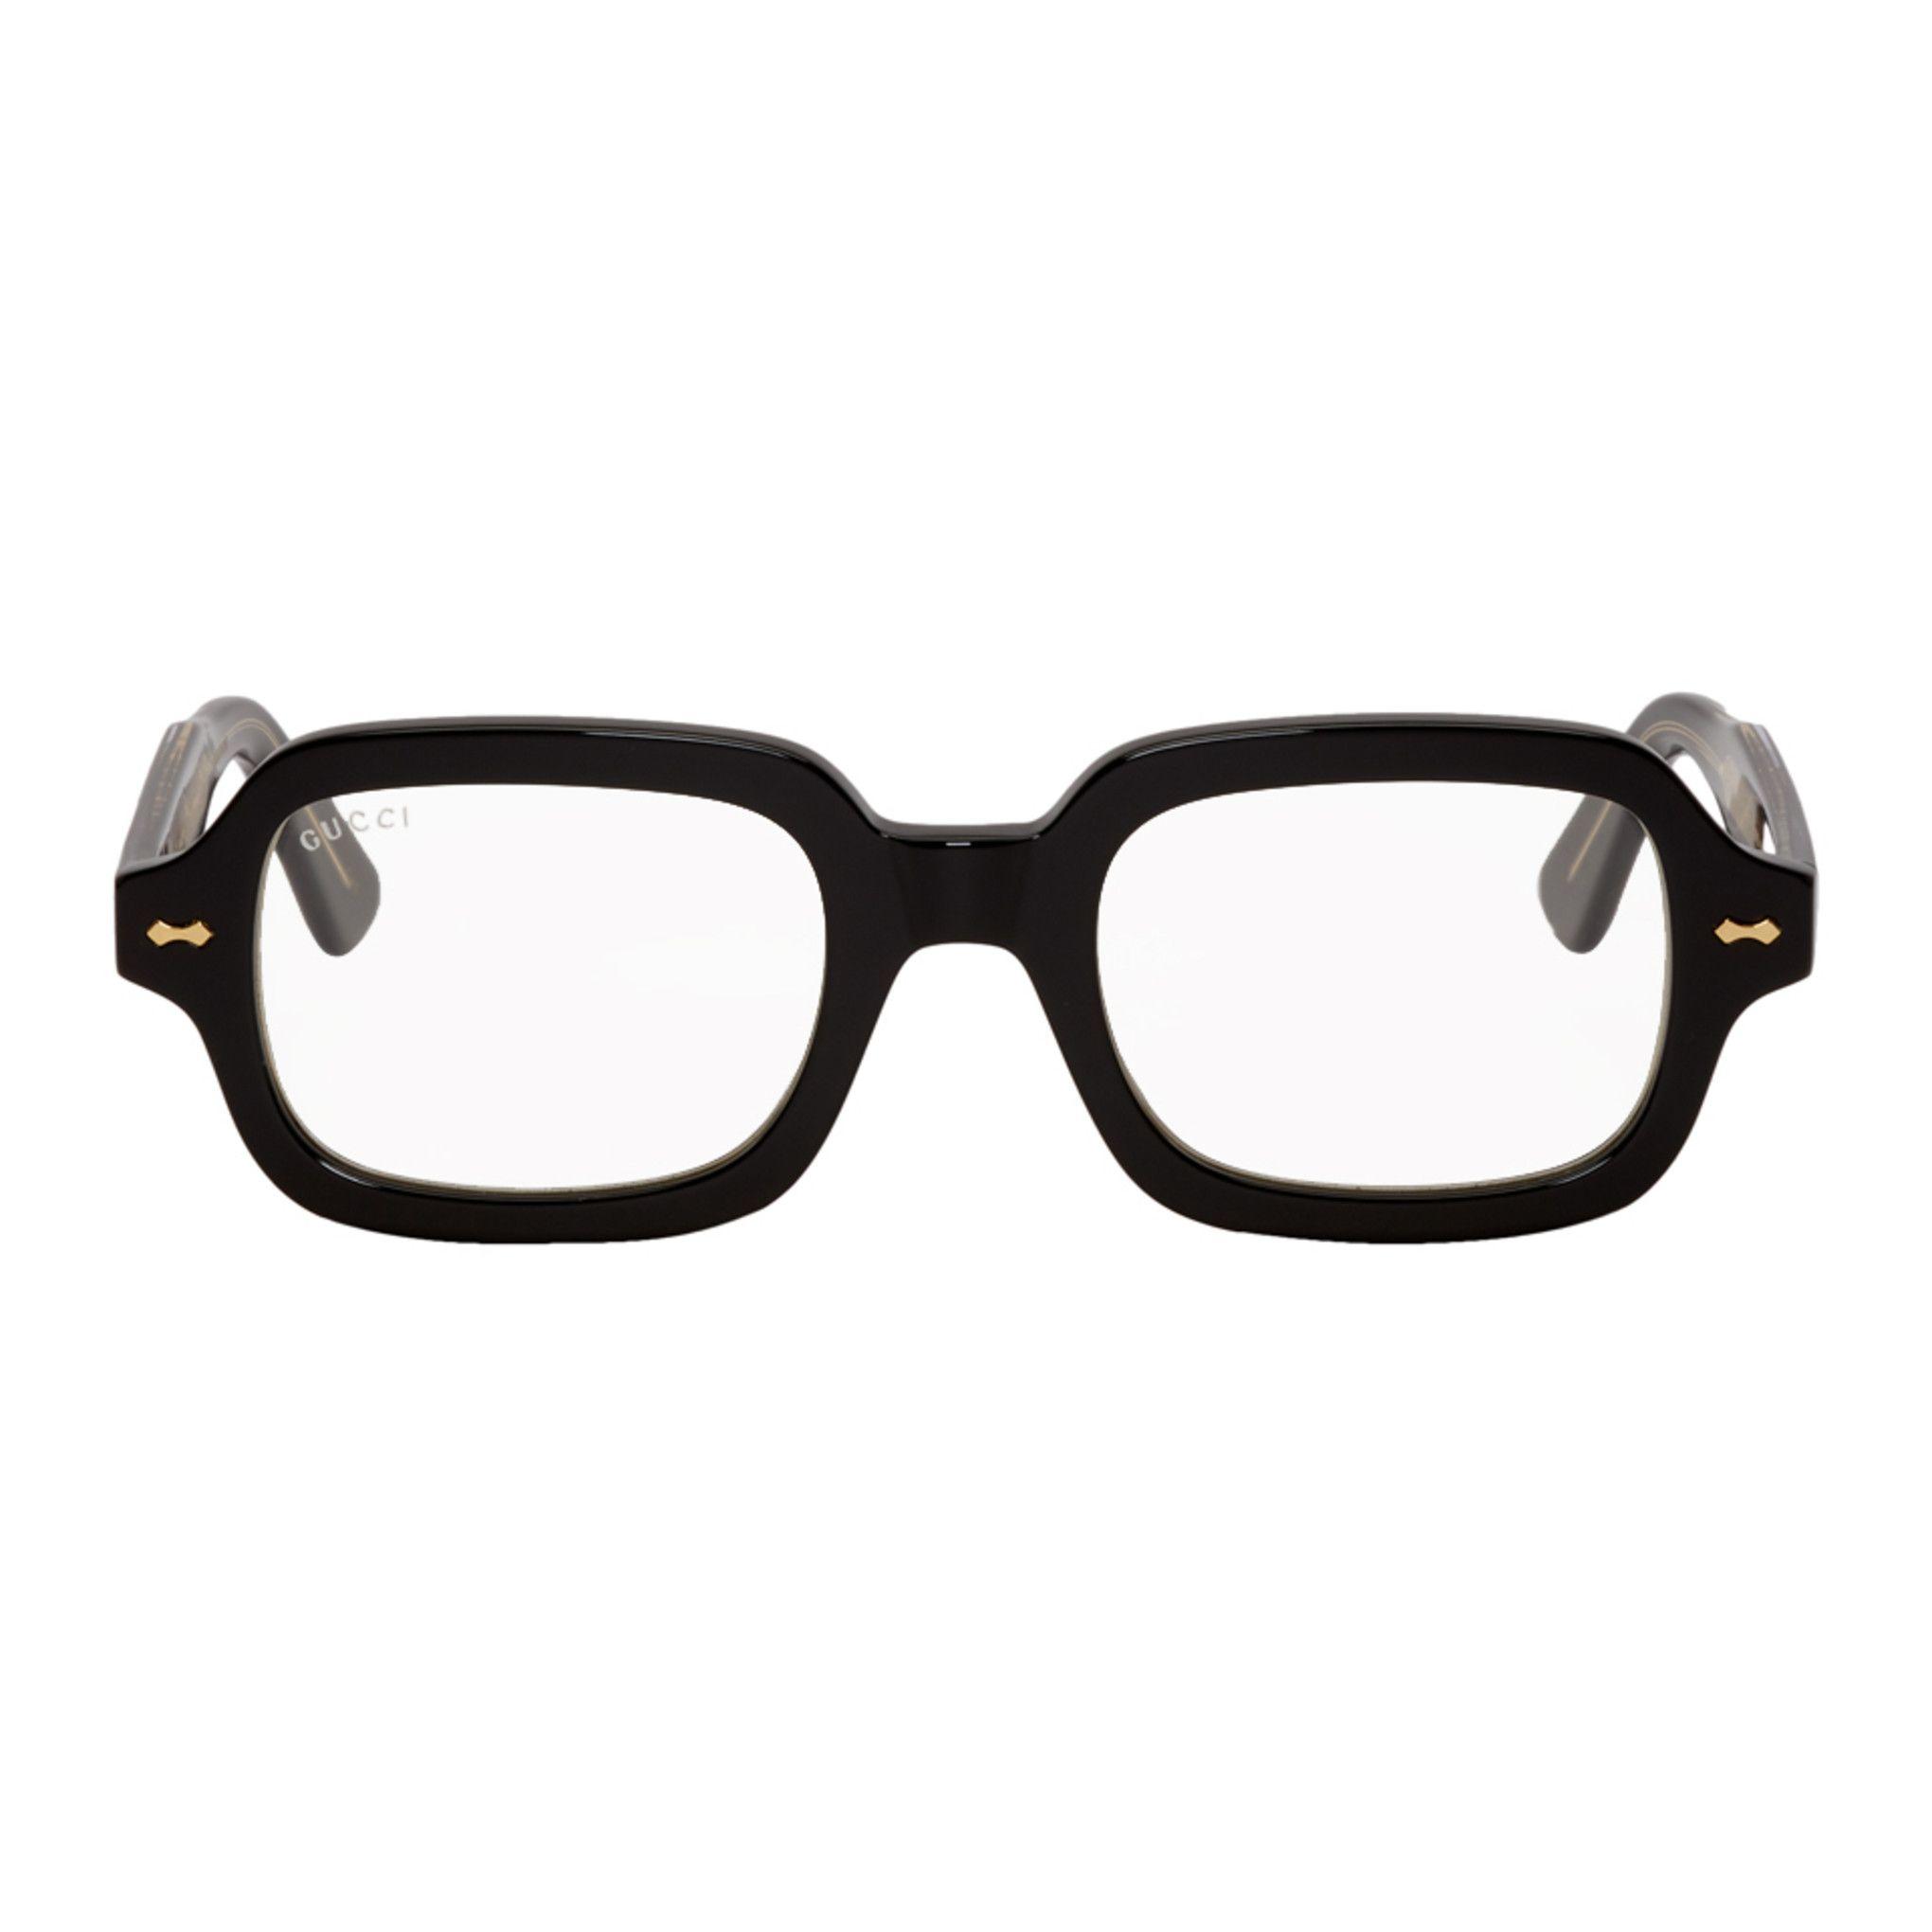 Gucci Black Rectangular Glasses